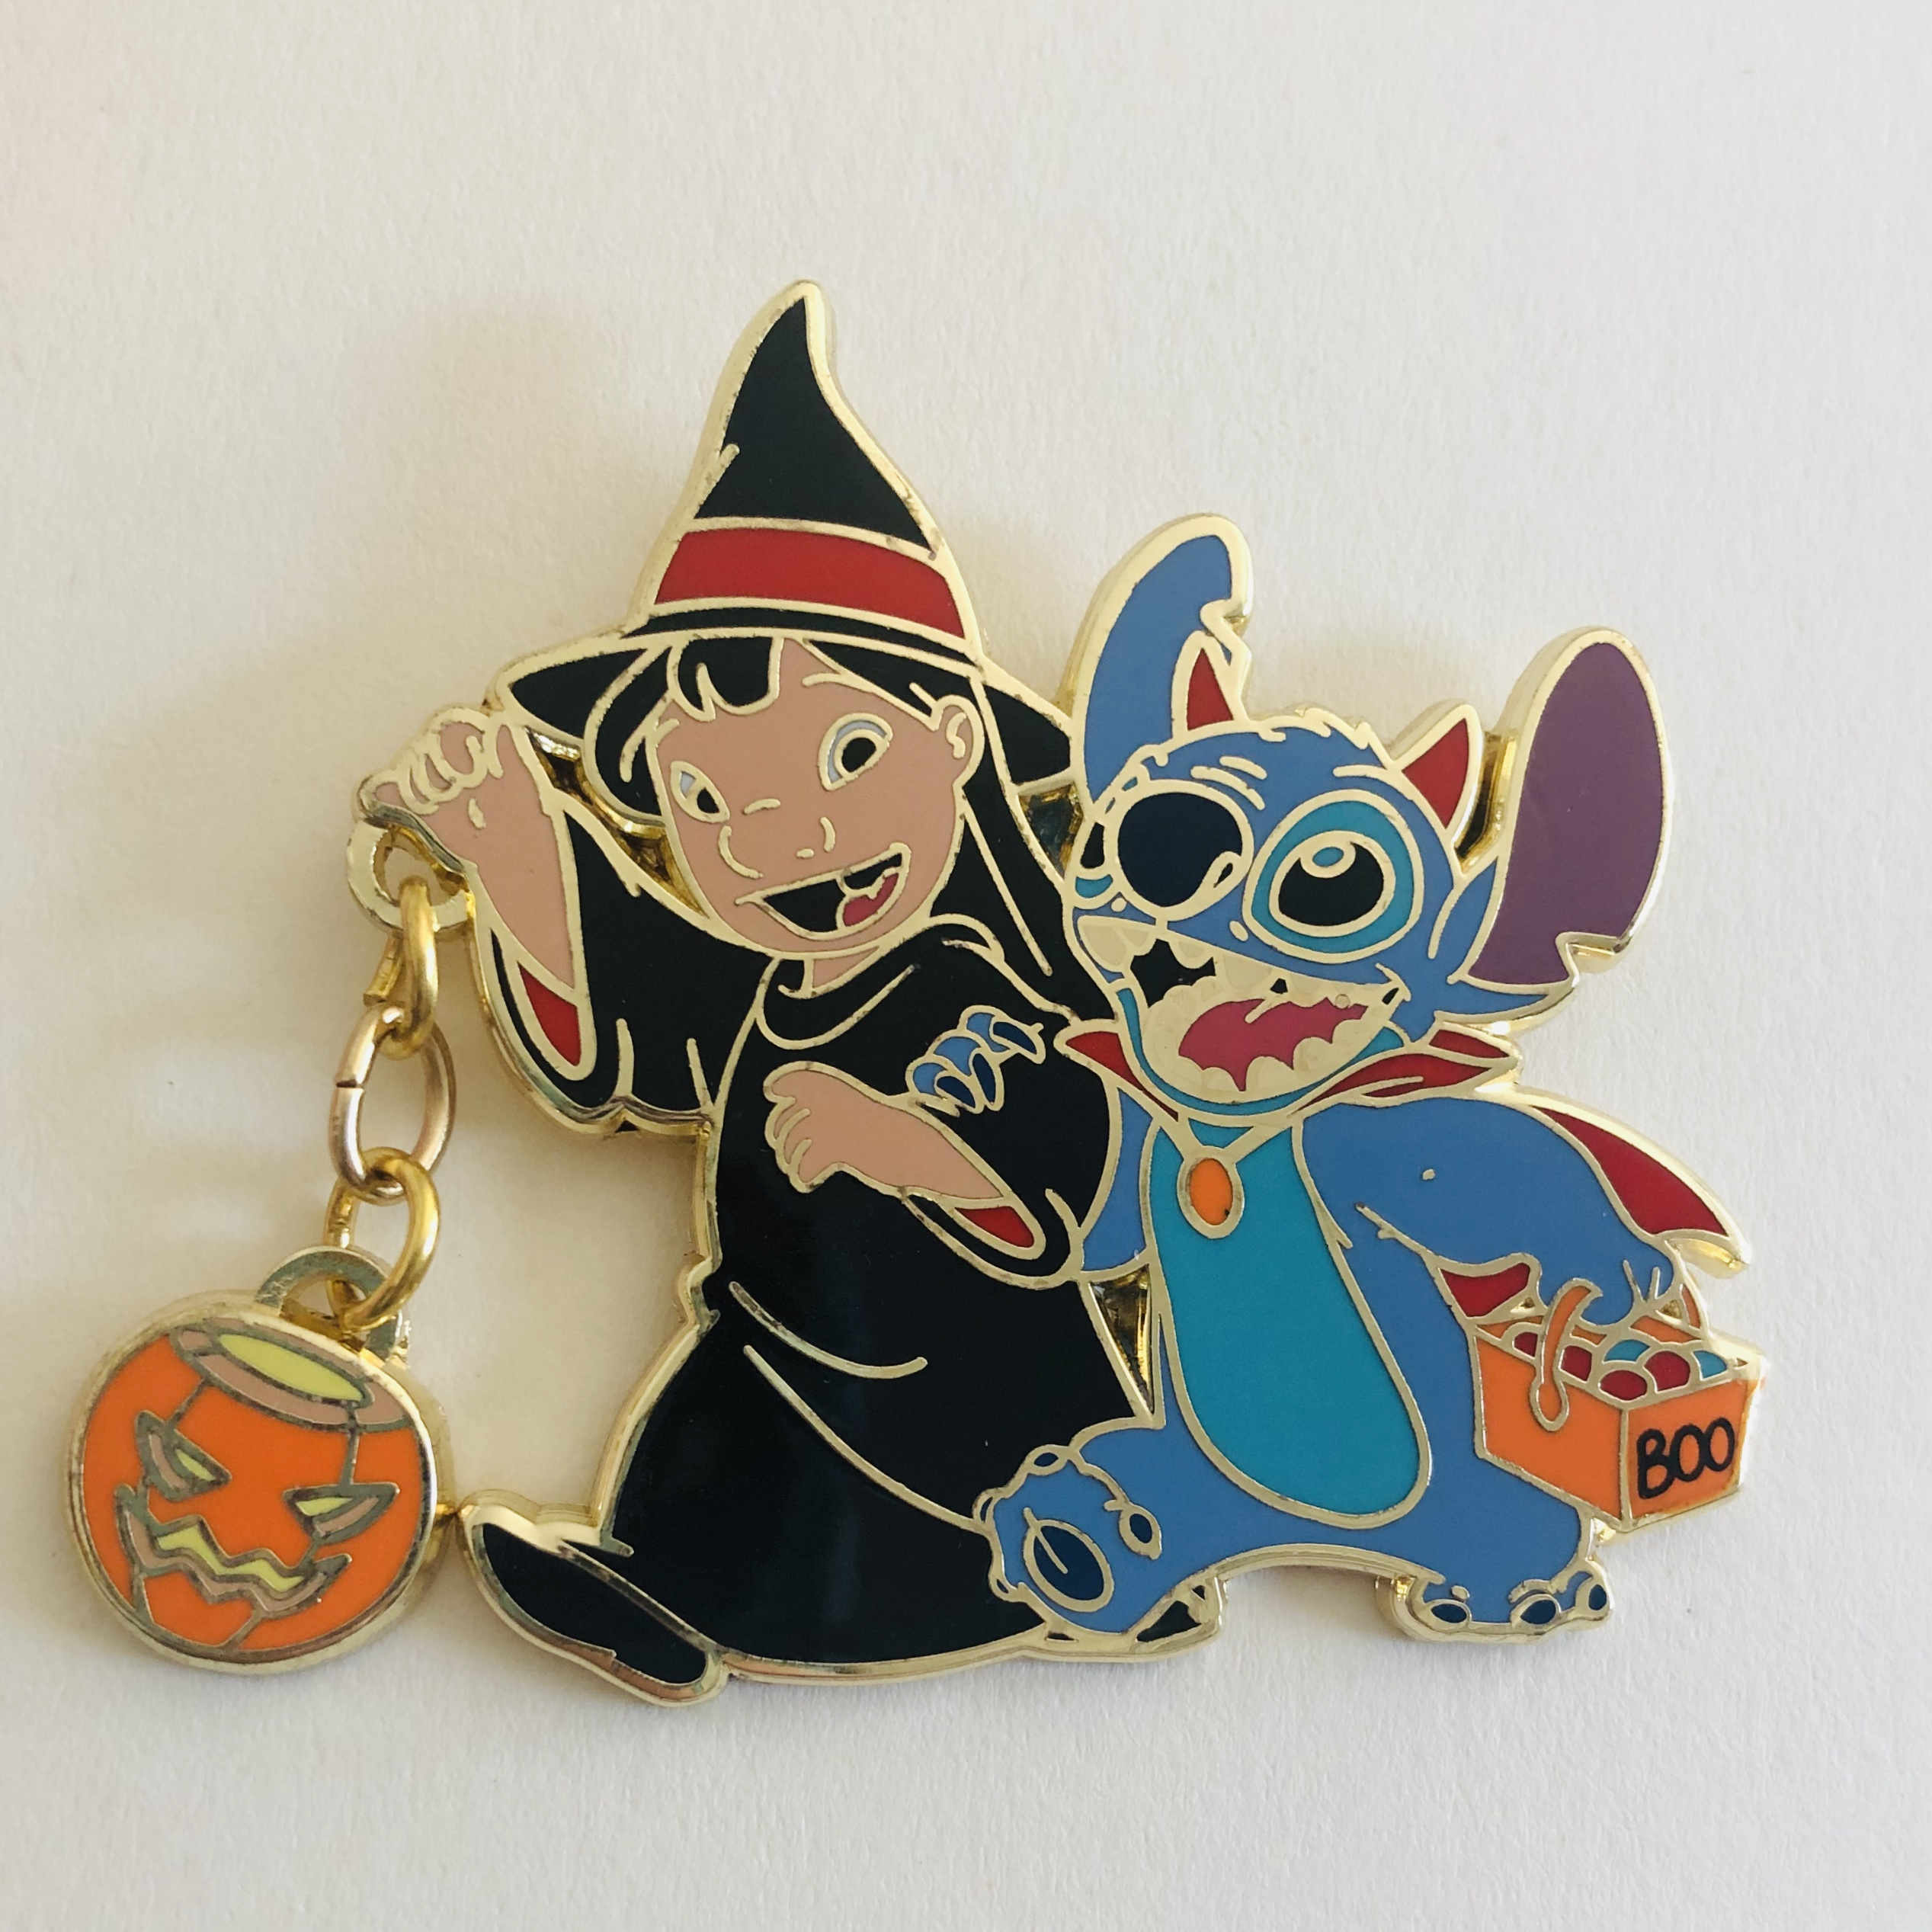 Lilo dressed as a witch, Stitch dressed as a devil